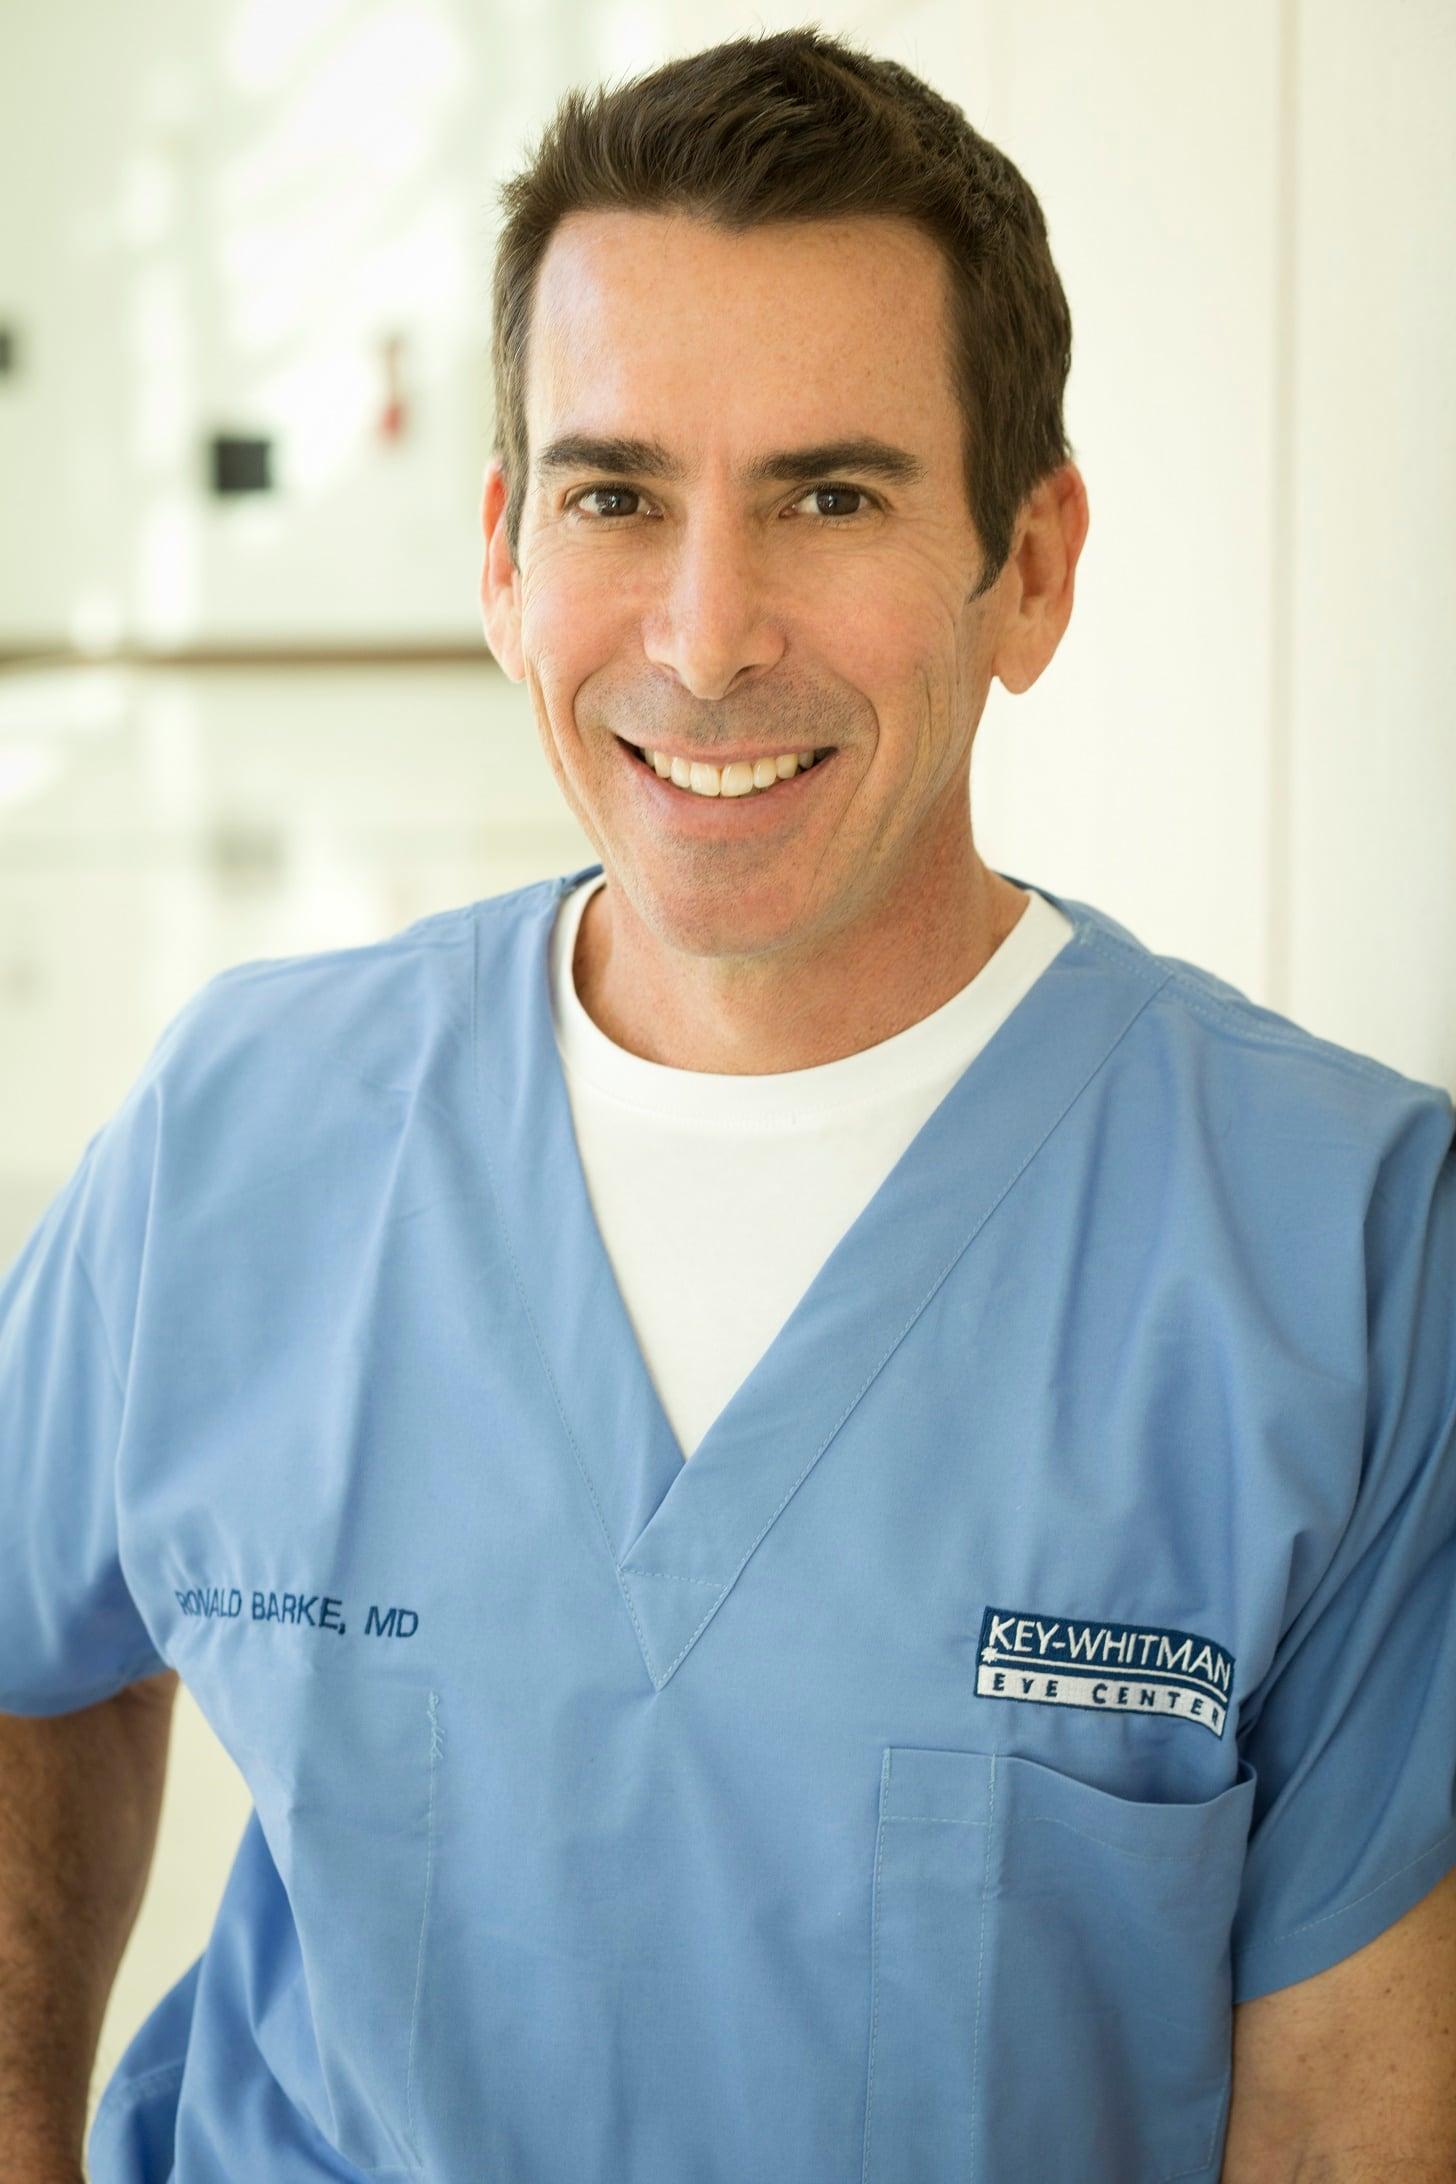 Dr. Ronald M Barke MD